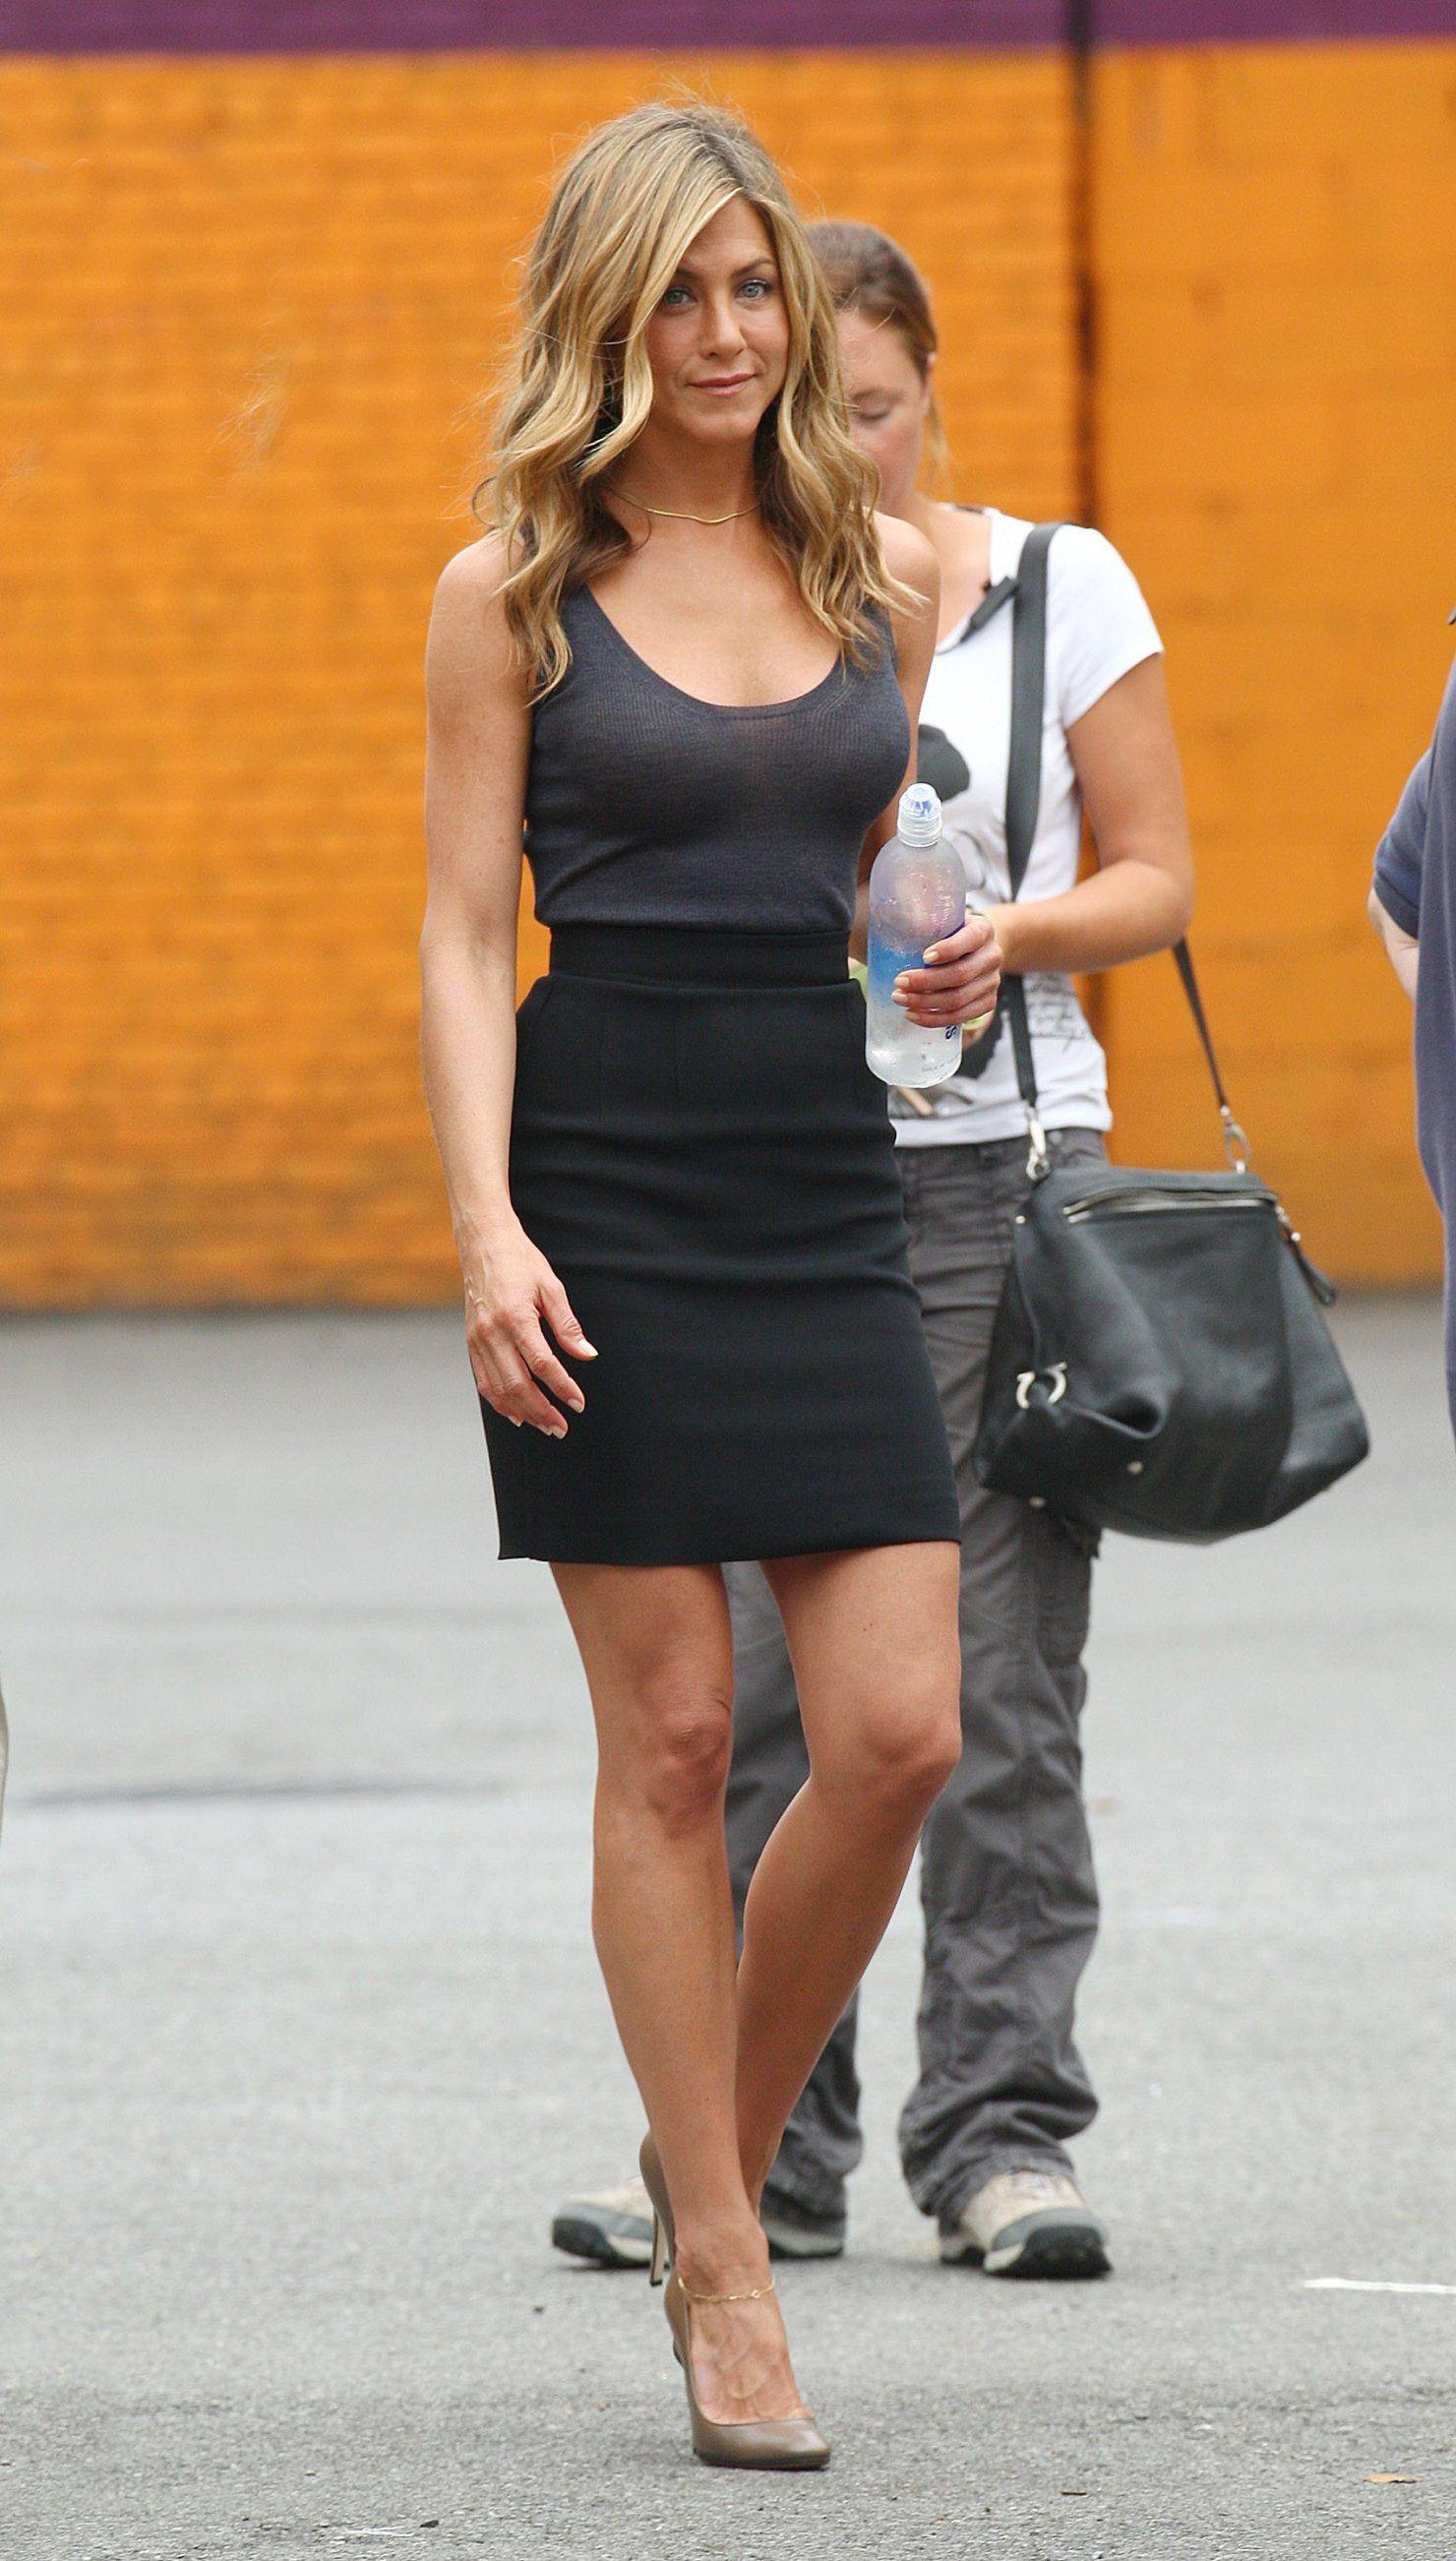 Jennifer Aniston Candids on the Set Of Bounty Hunter in New York, Jul 17, 2009